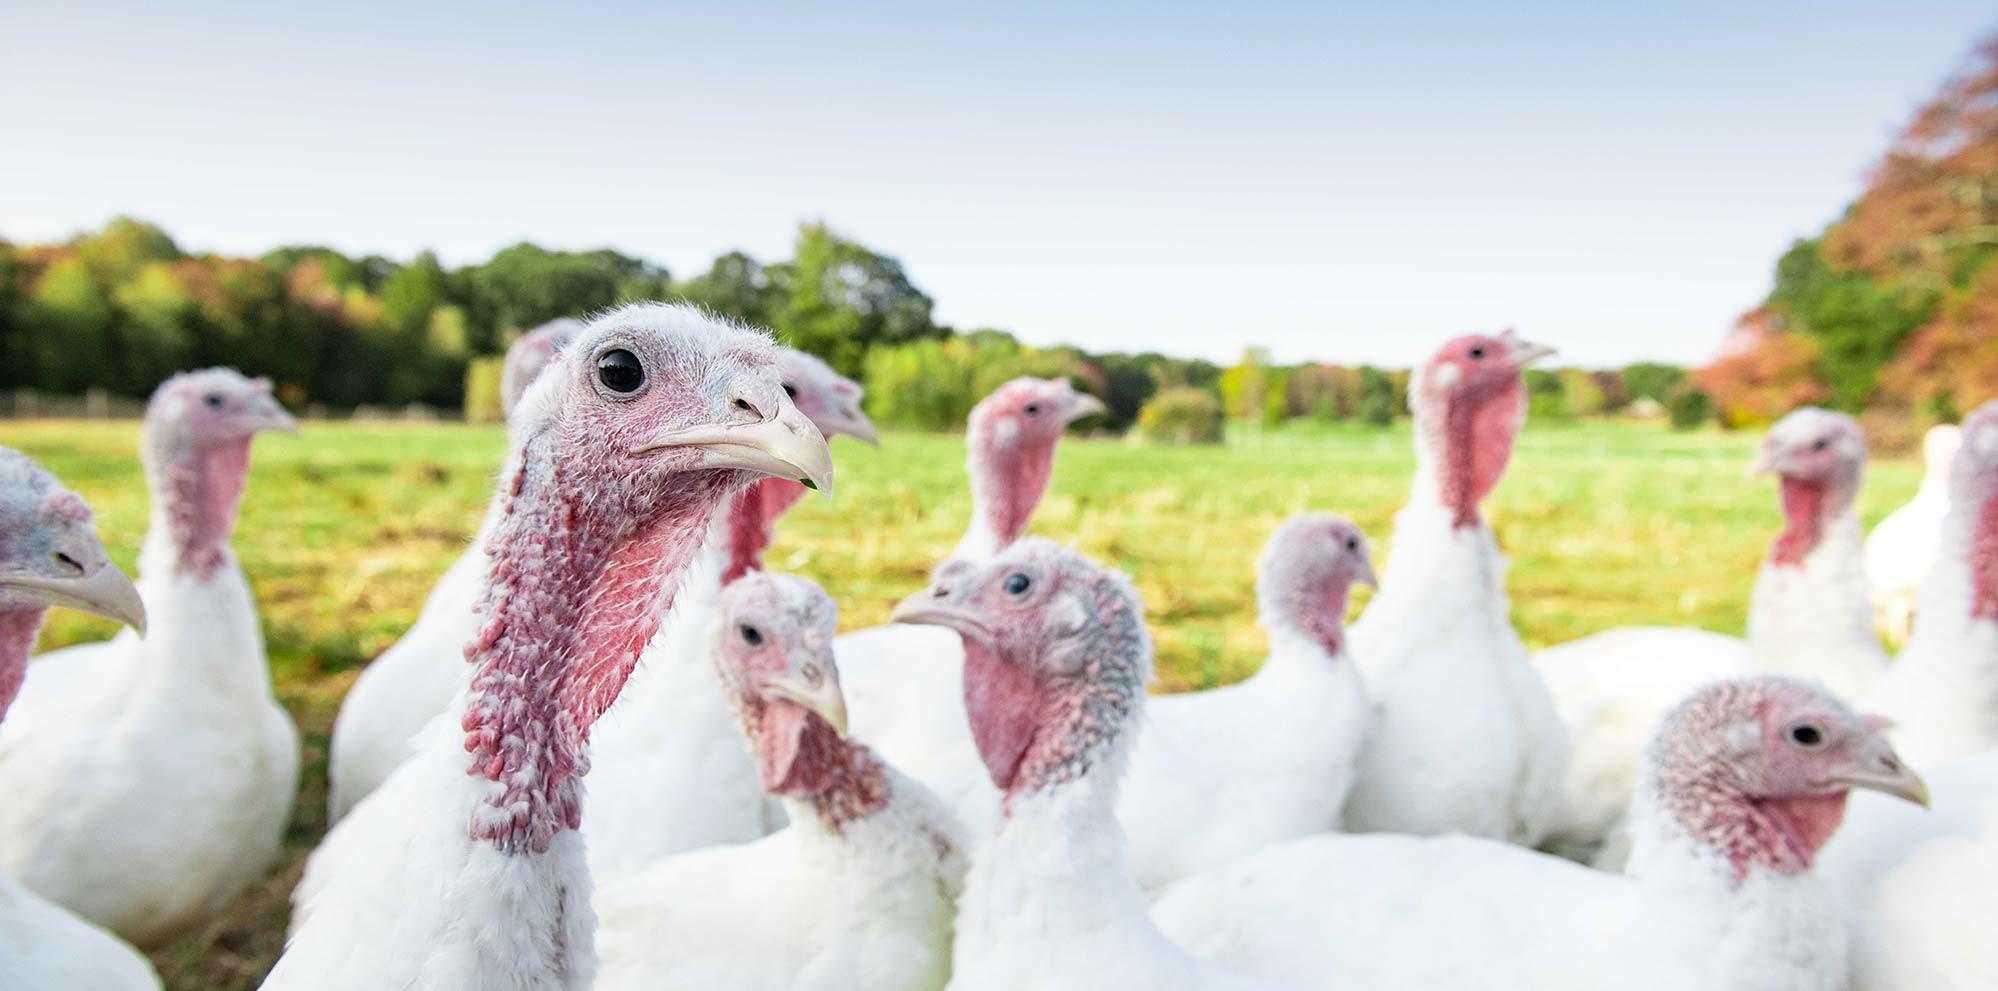 Pastured turkeys at Pat's Pastured